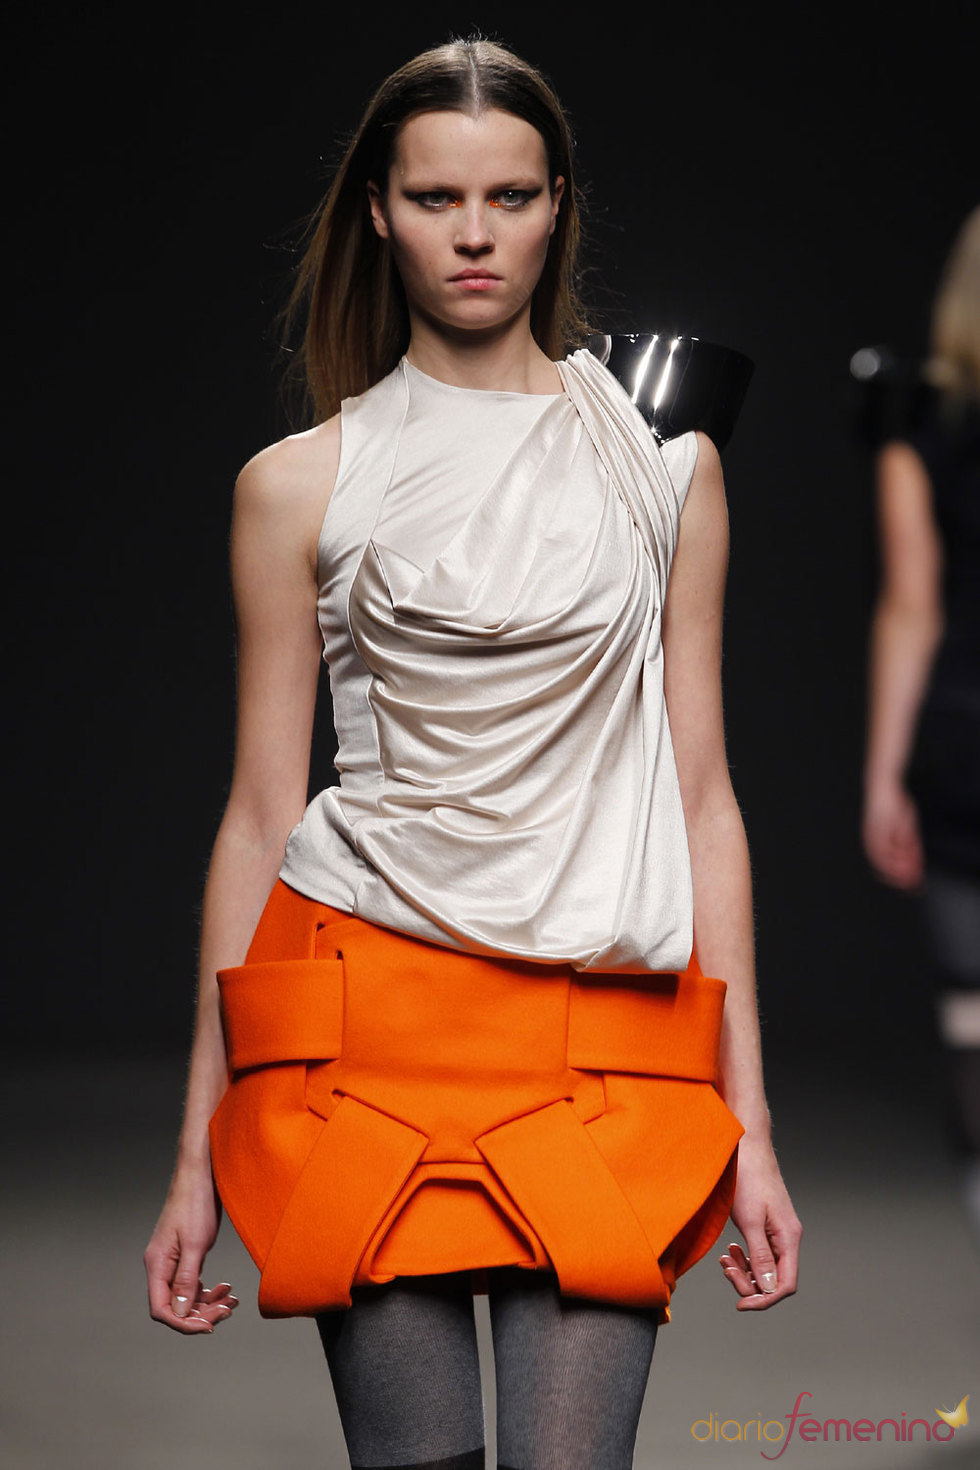 Amaya Arzuaga - Moda Otoño Invierno 2010 - 2011